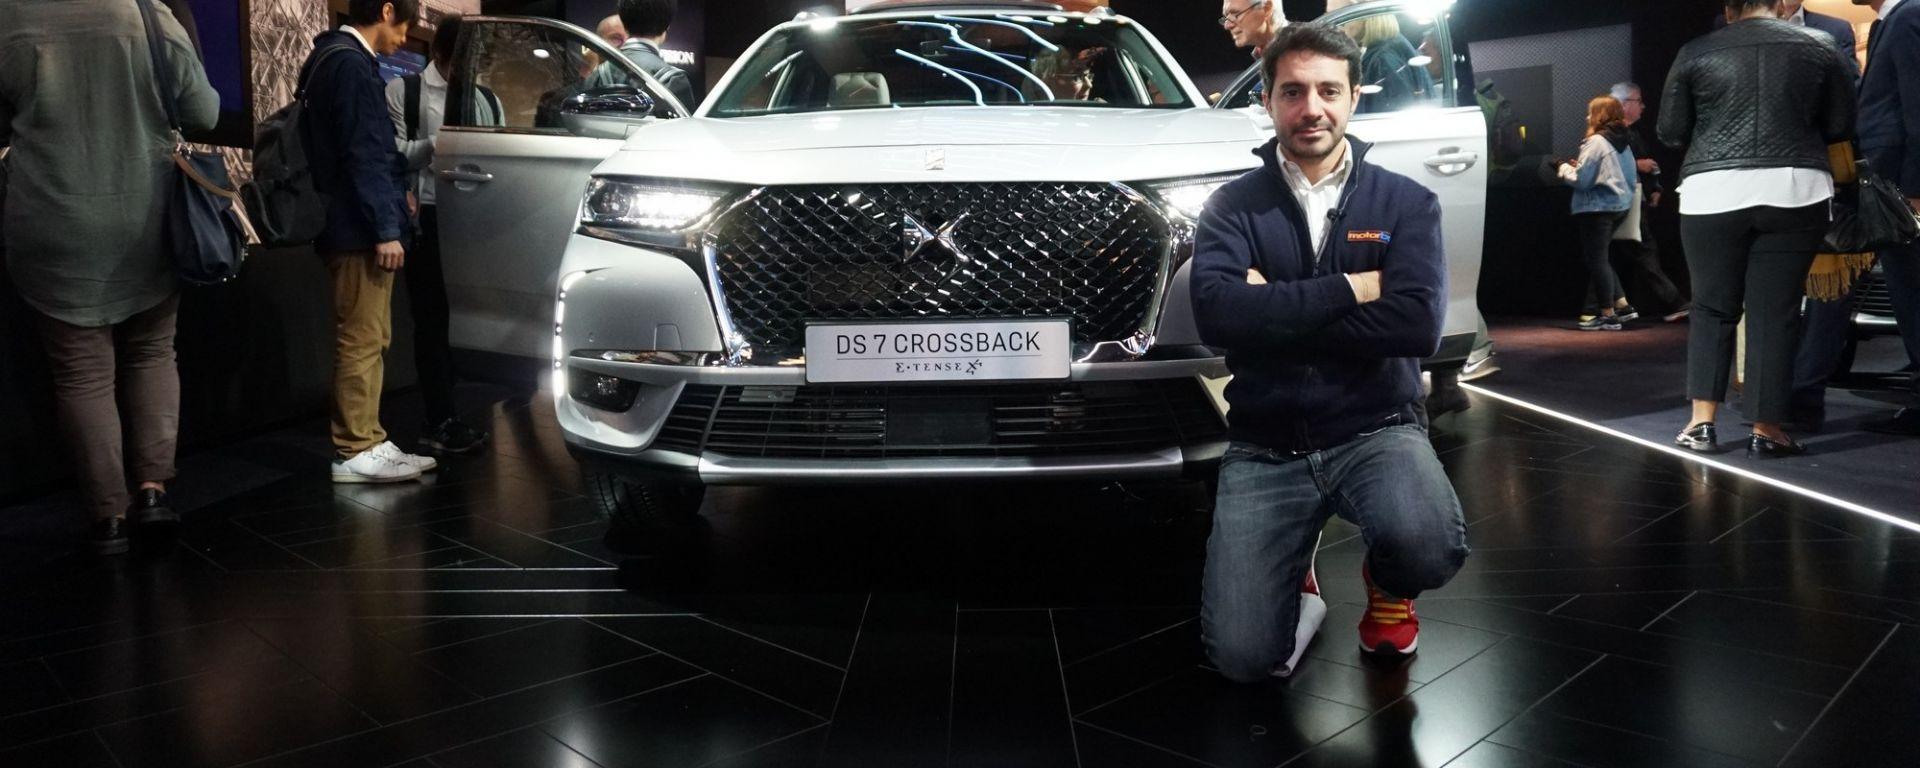 DS7 Crossback E-Tense 4x4, in anteprima a Parigi 2018